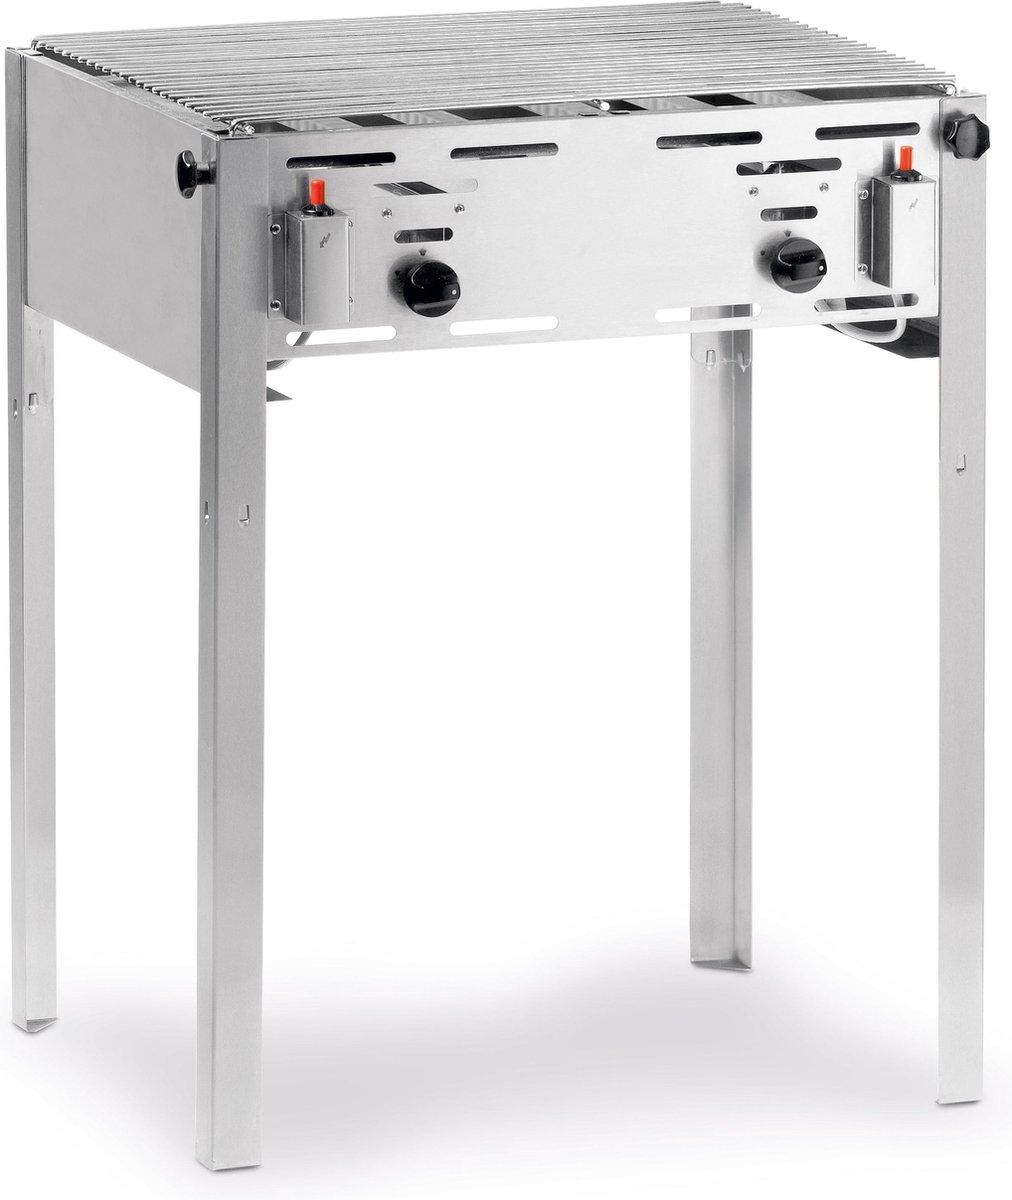 Barbecue met rooster gas middel 54 x 65 cm